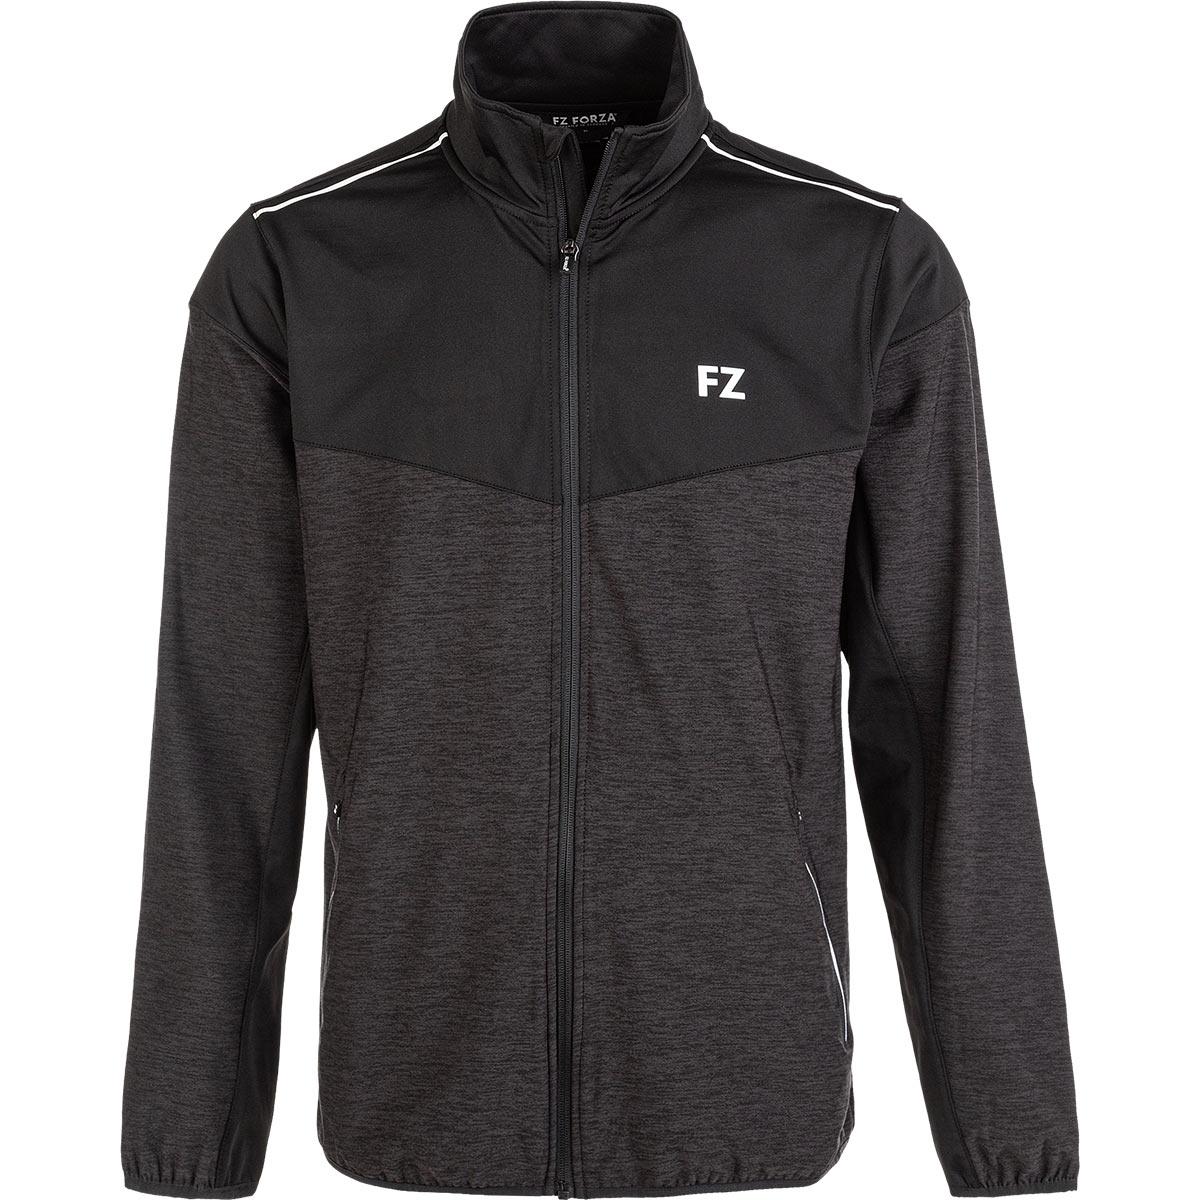 FZ Bradford Jr. Jacket